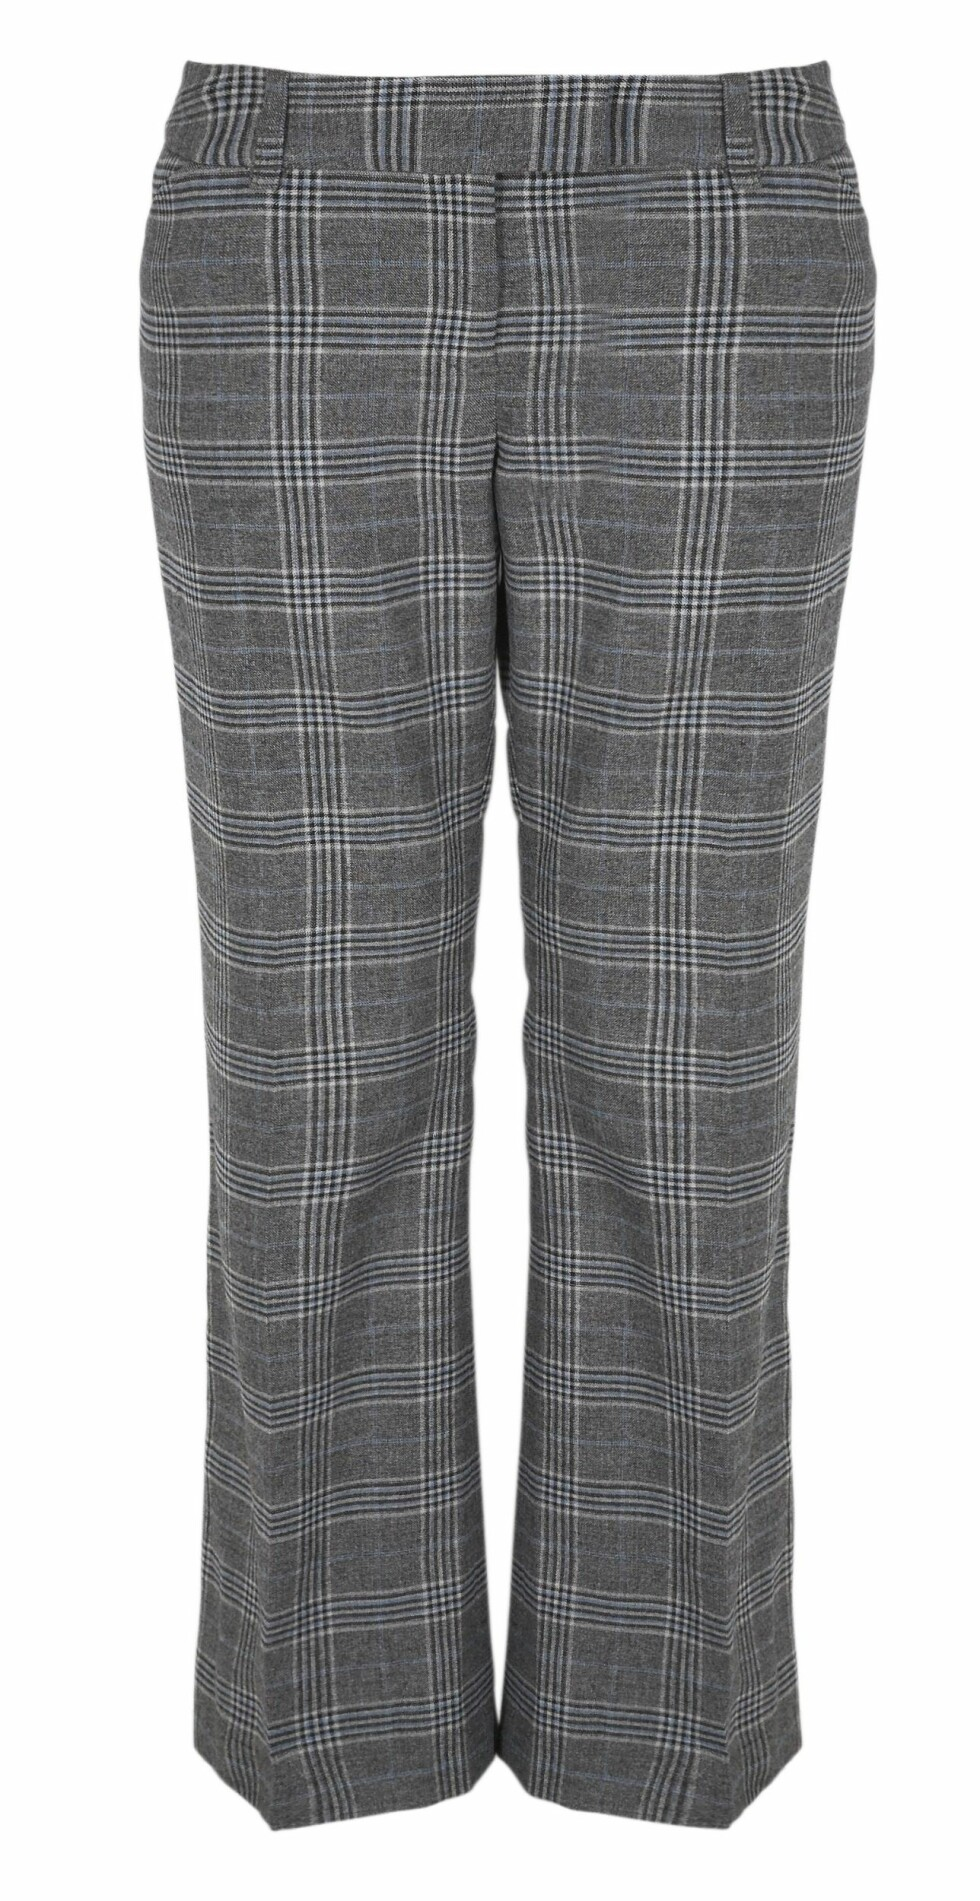 Bukse (kr 1500, Tommy Hilfiger). Foto: Produsenten